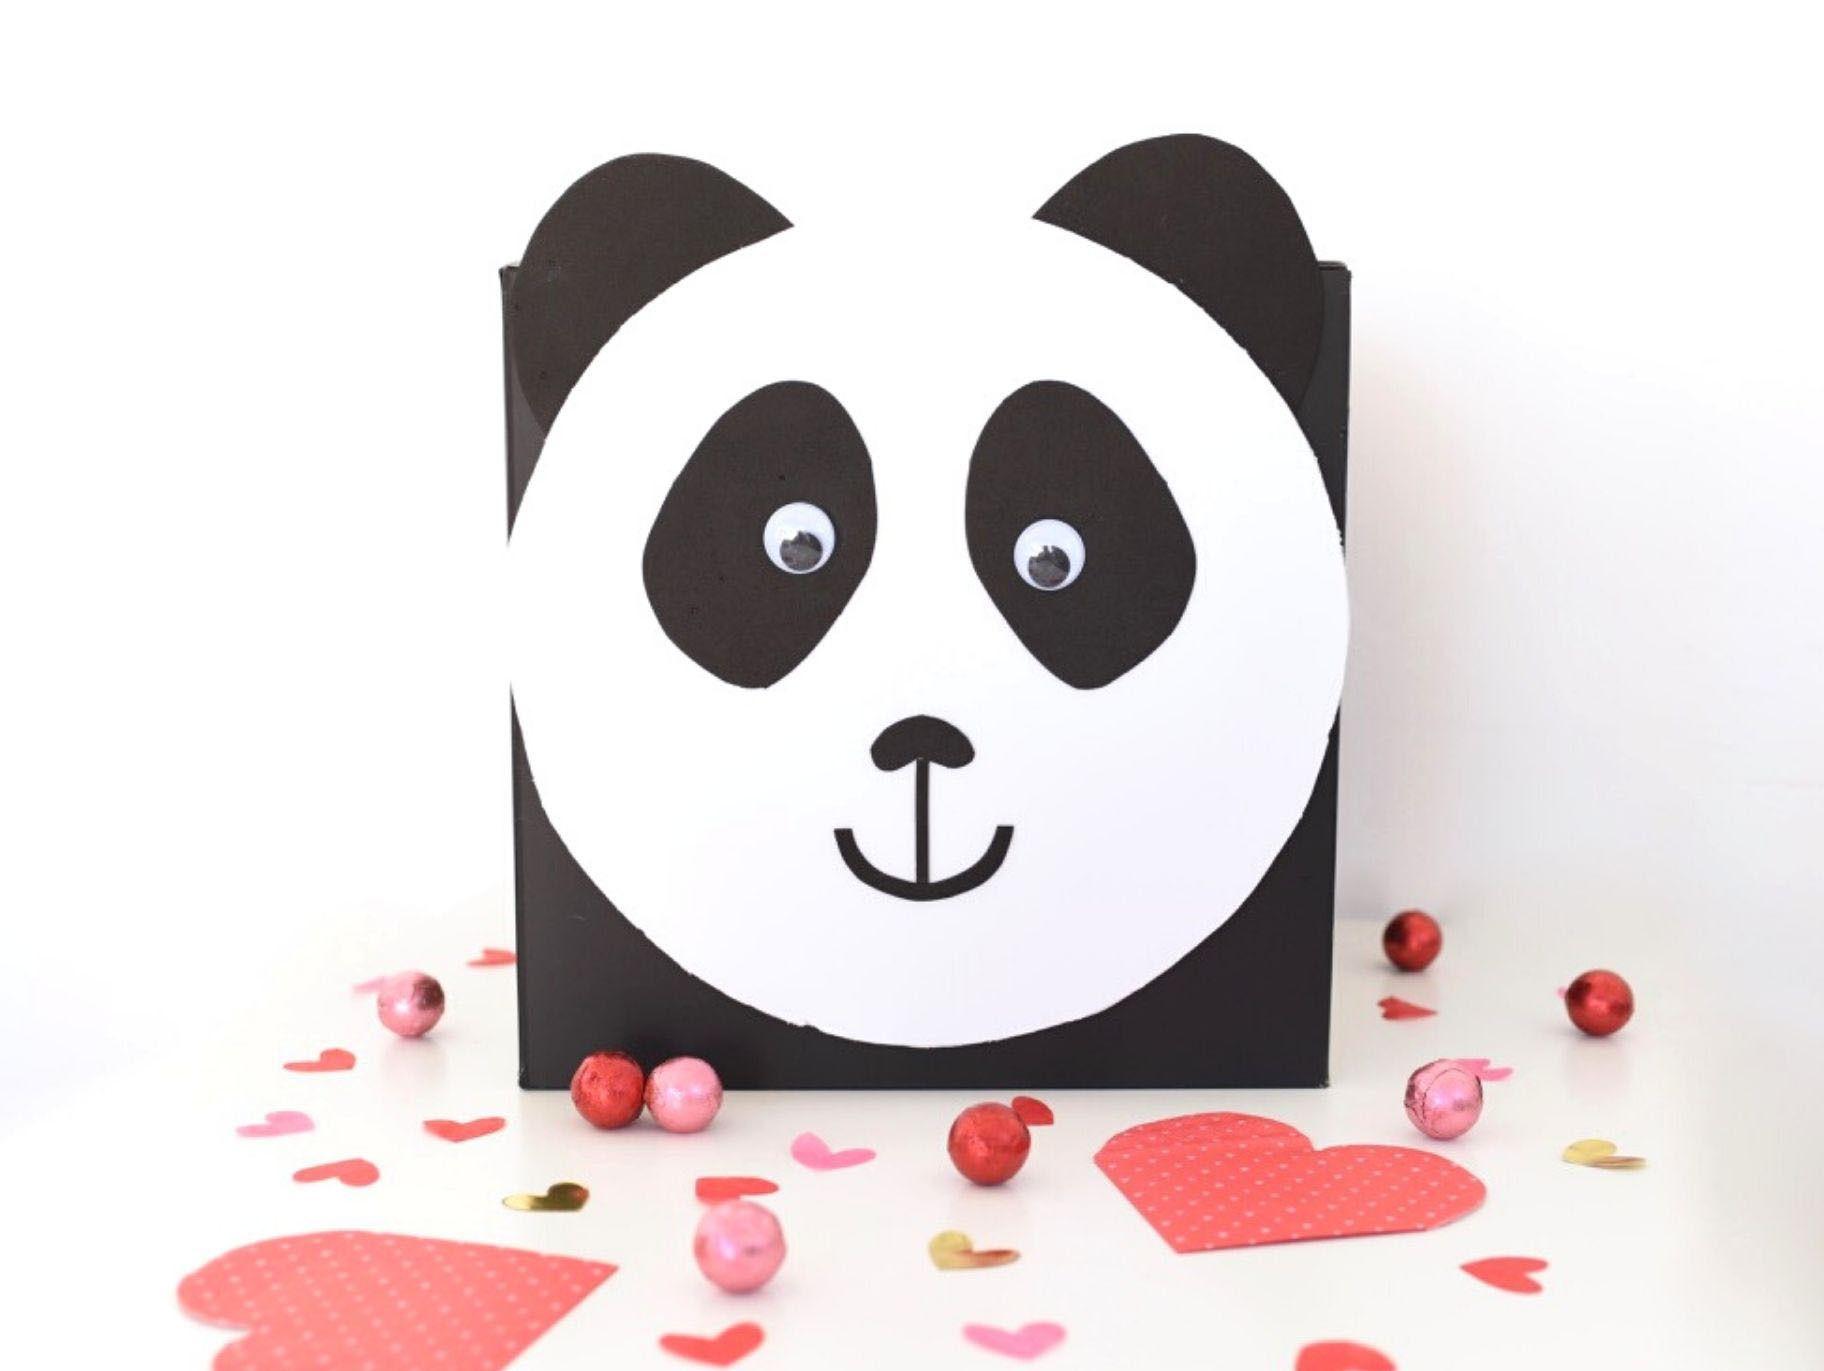 Diy Panda Valentine Card Box Valentine Card Box Valentines Cards Valentine Day Cards